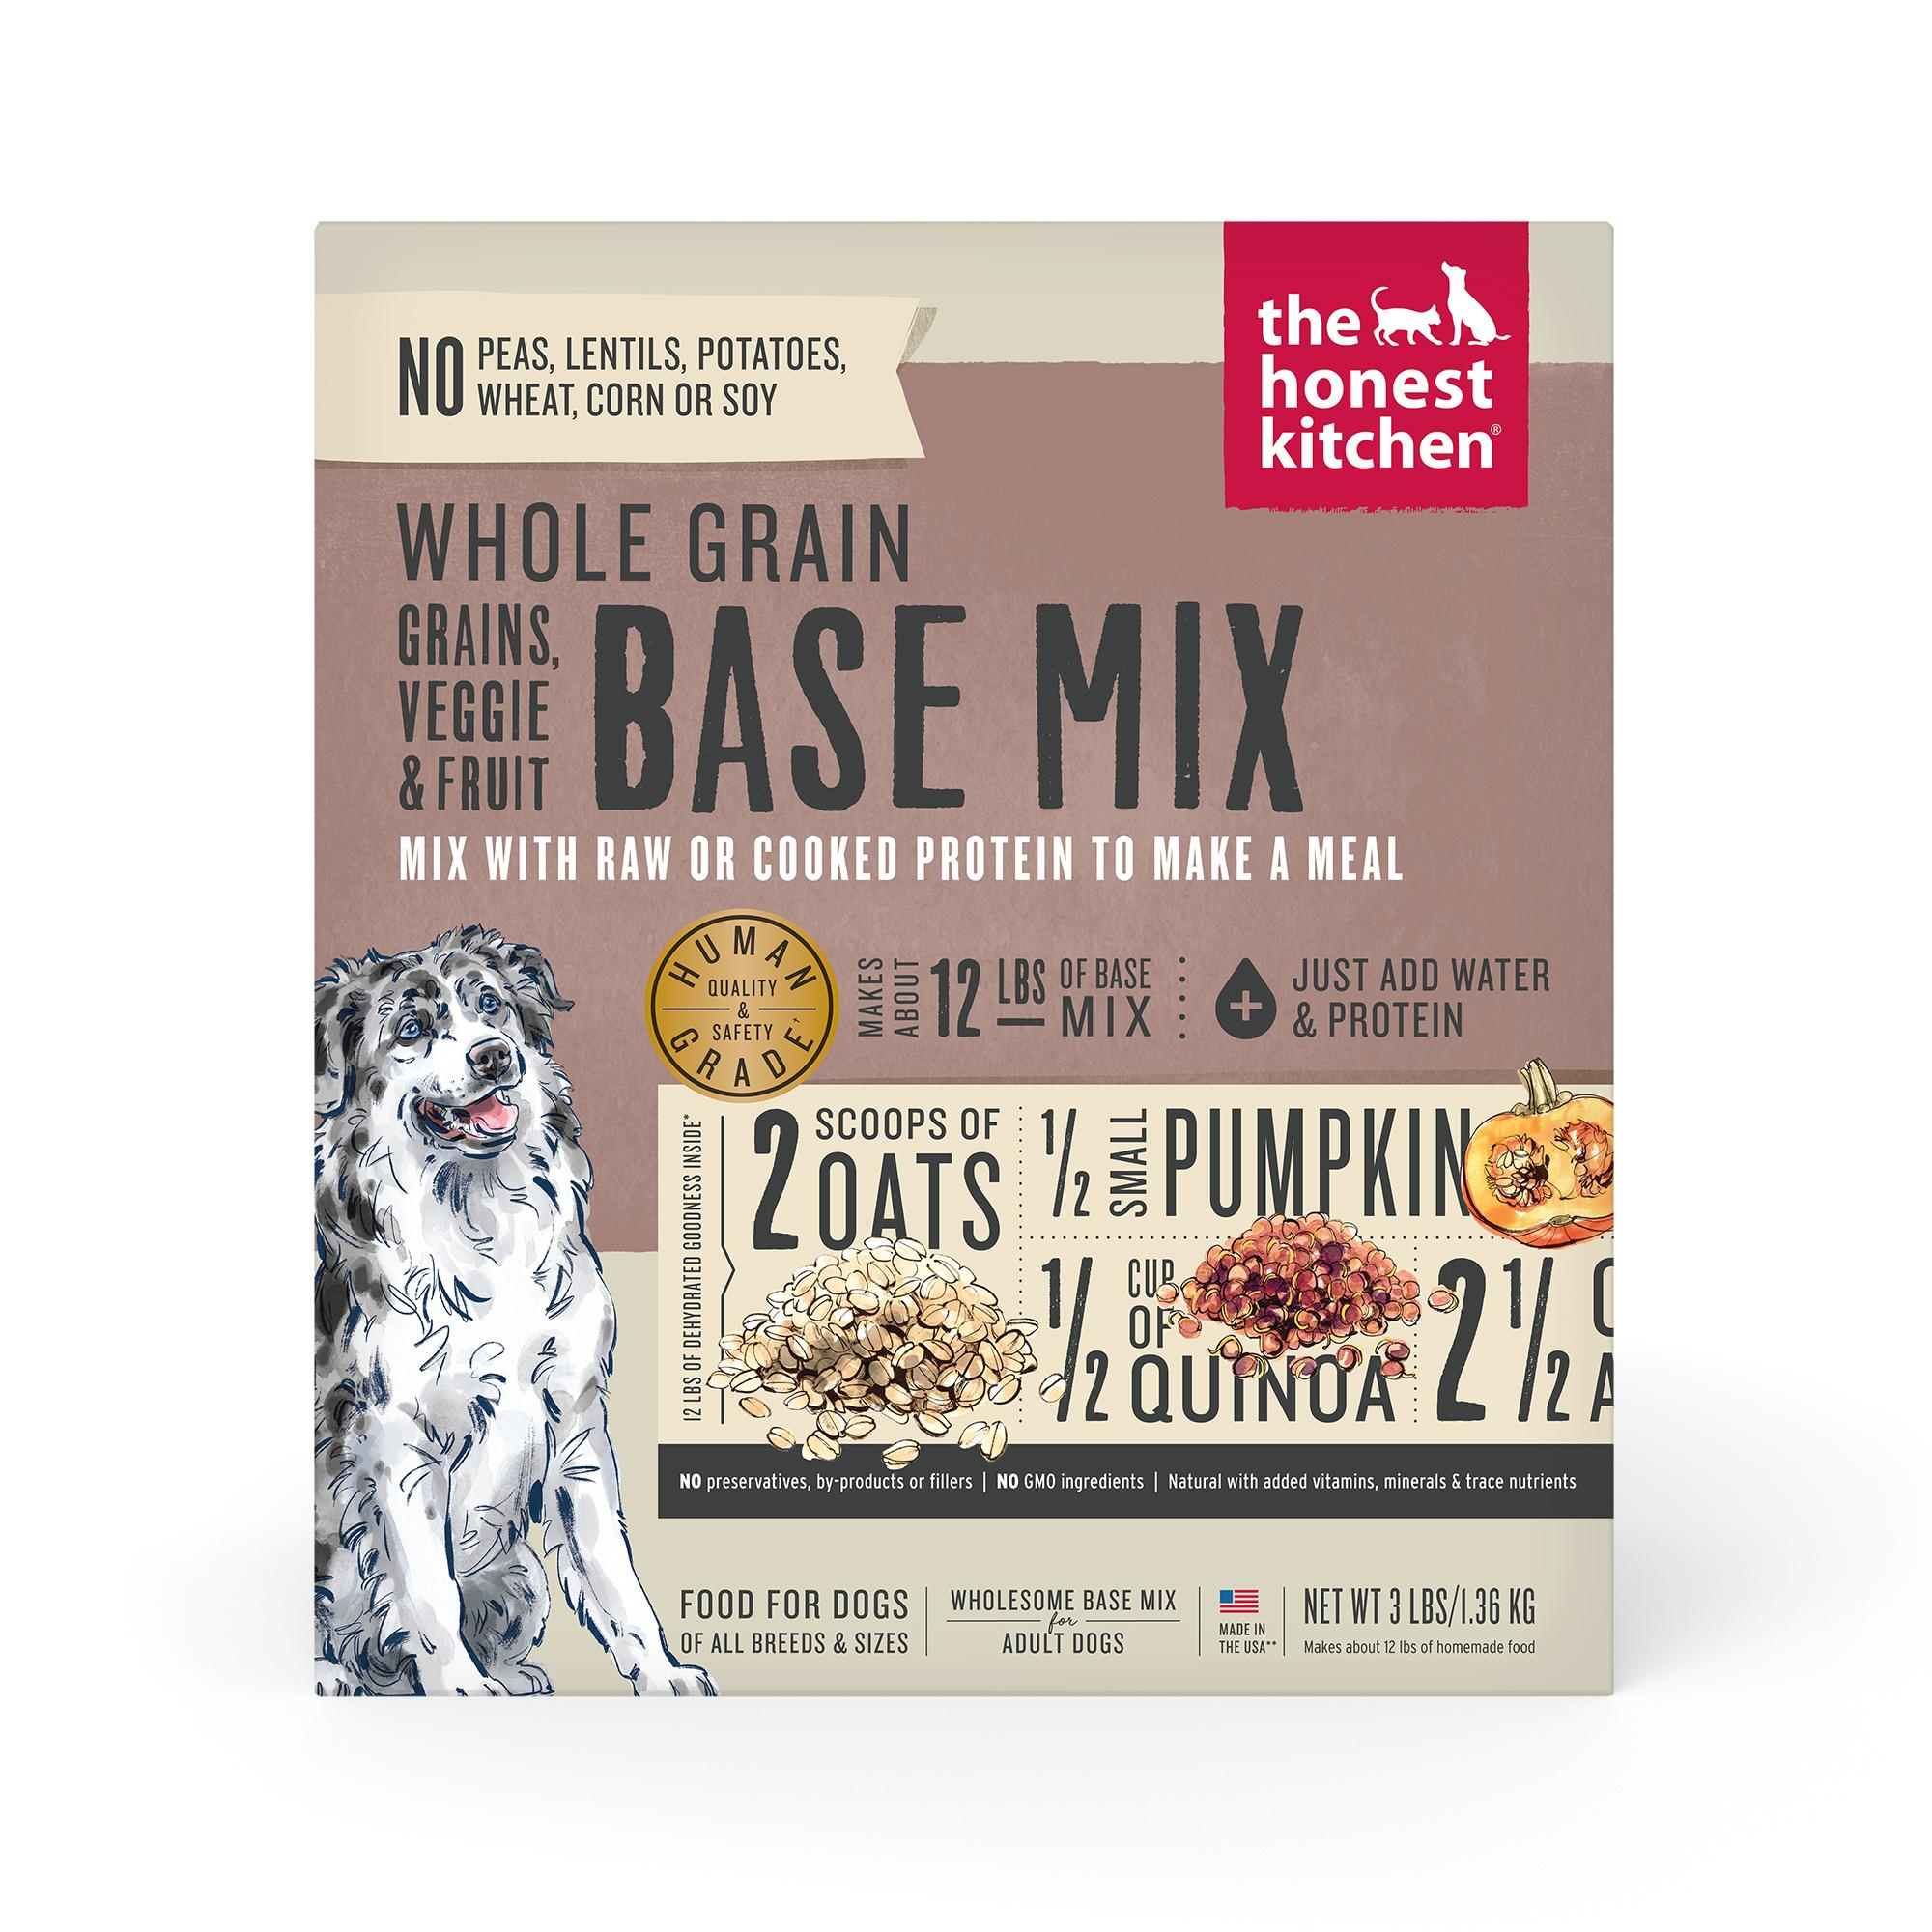 The Honest Kitchen Whole Grain Veggie & Fruits Base Mix Dehydrated Dog Food Image